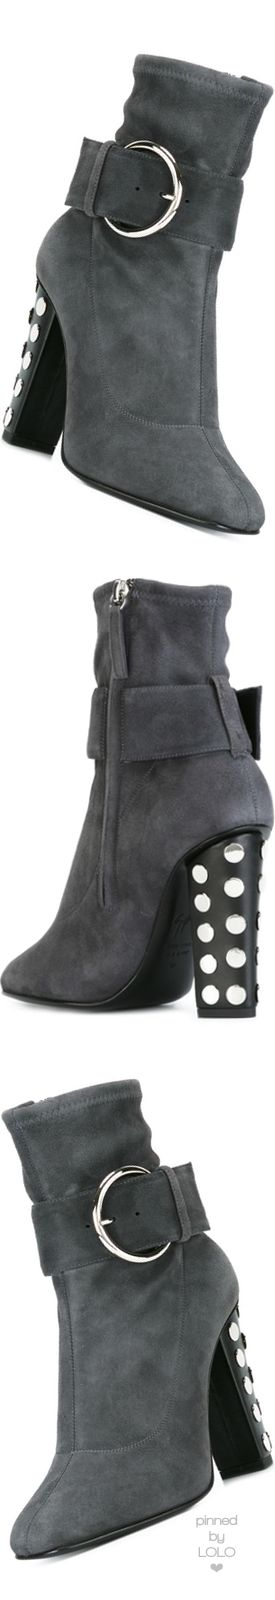 GIUSEPPE ZANOTTI DESIGN Embellished Heel Boots Ferro | LOLO❤︎